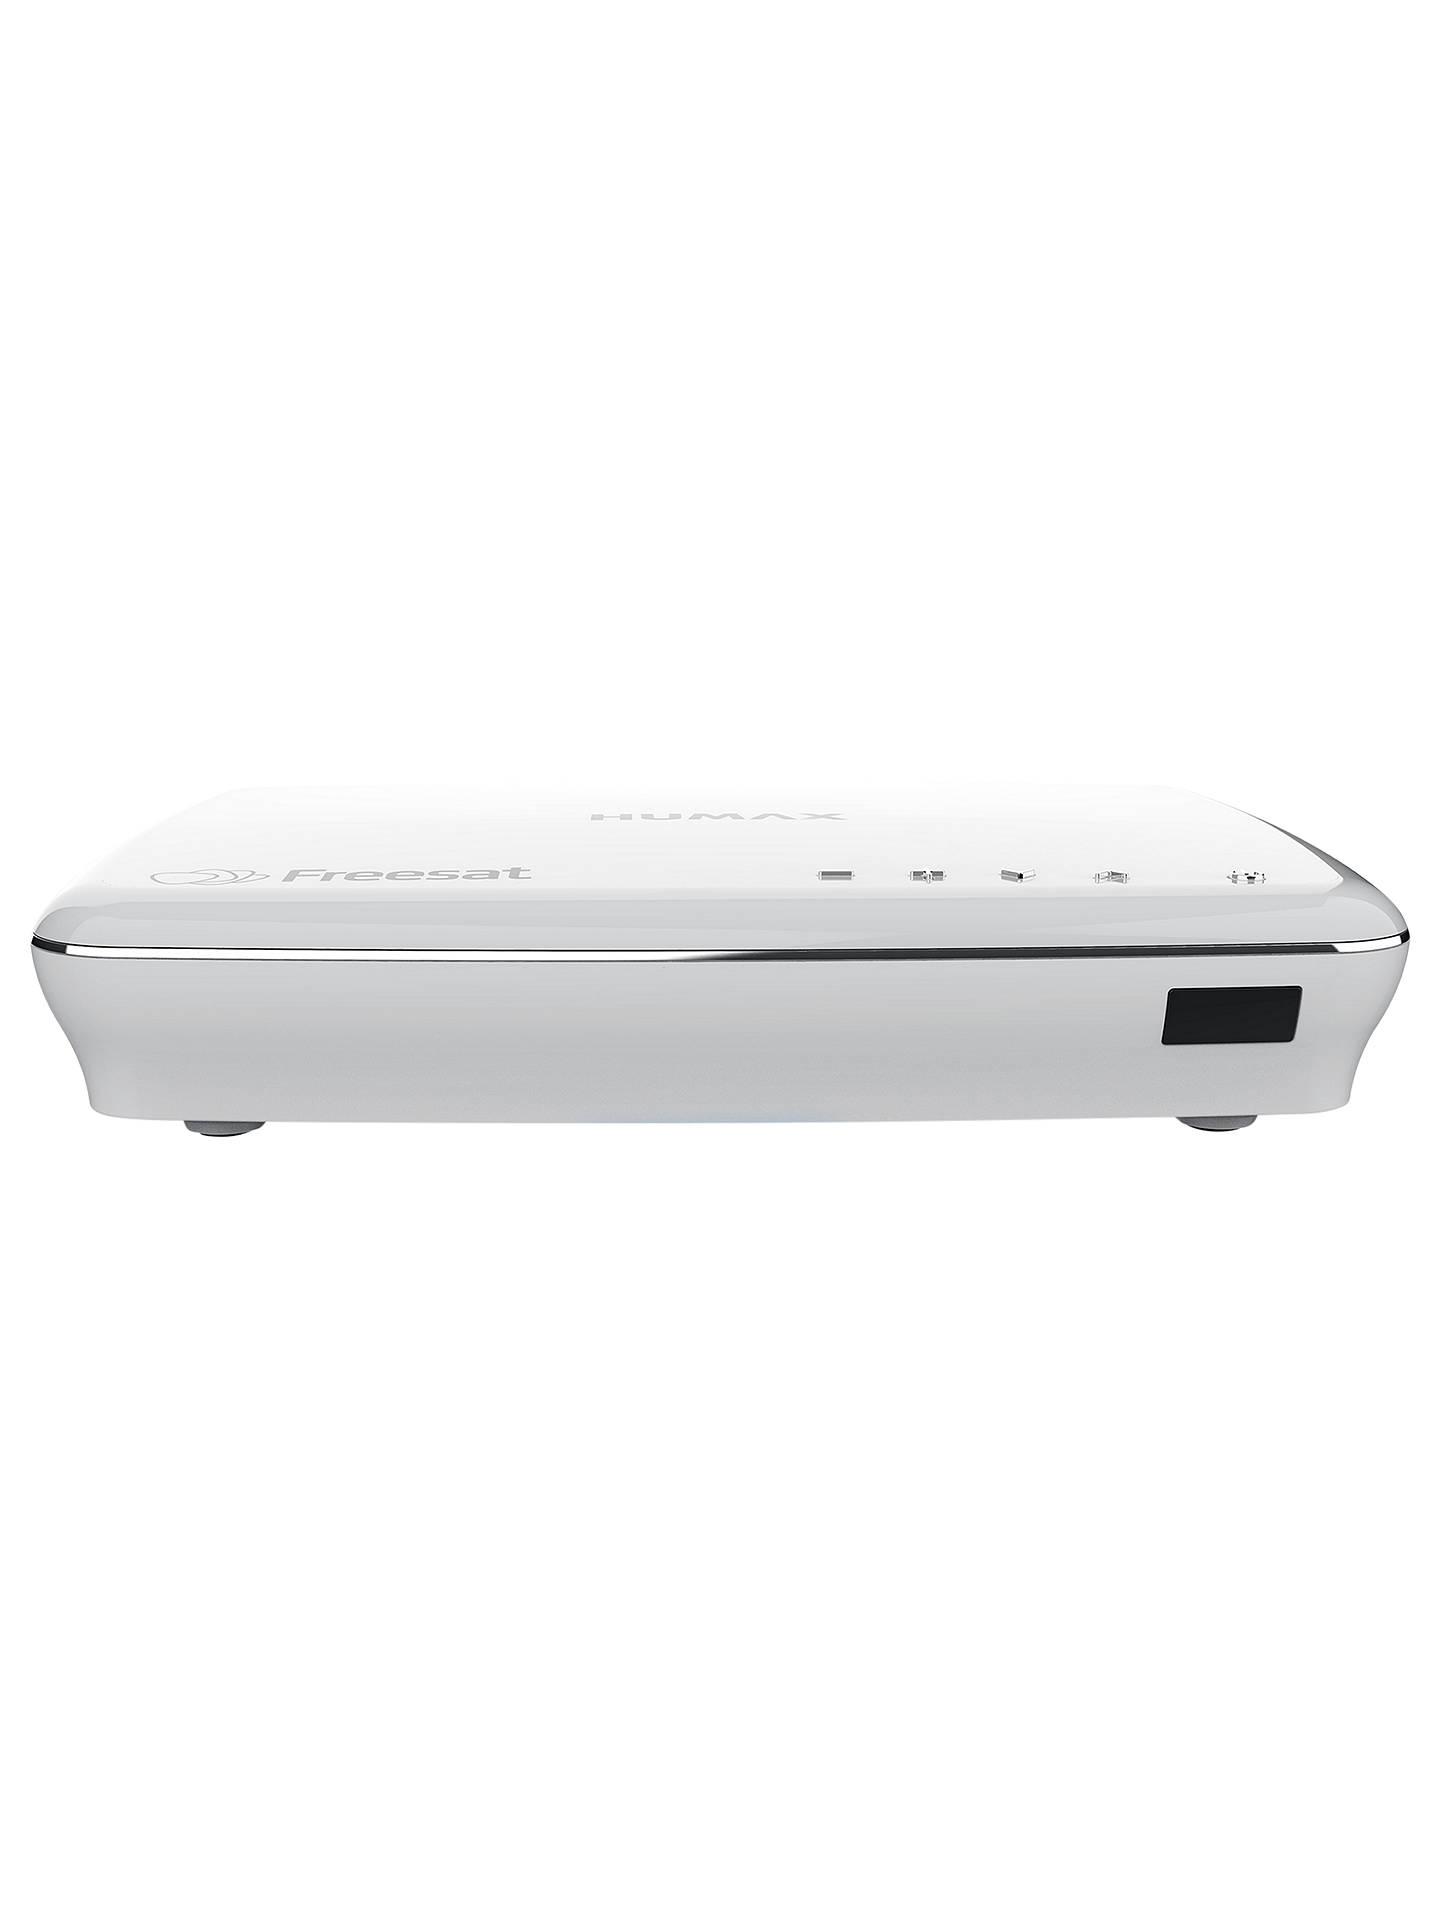 f850833f5133 Buy Humax HDR-1100S Smart 1TB Freesat Digital TV Recorder, White Online at  johnlewis ...